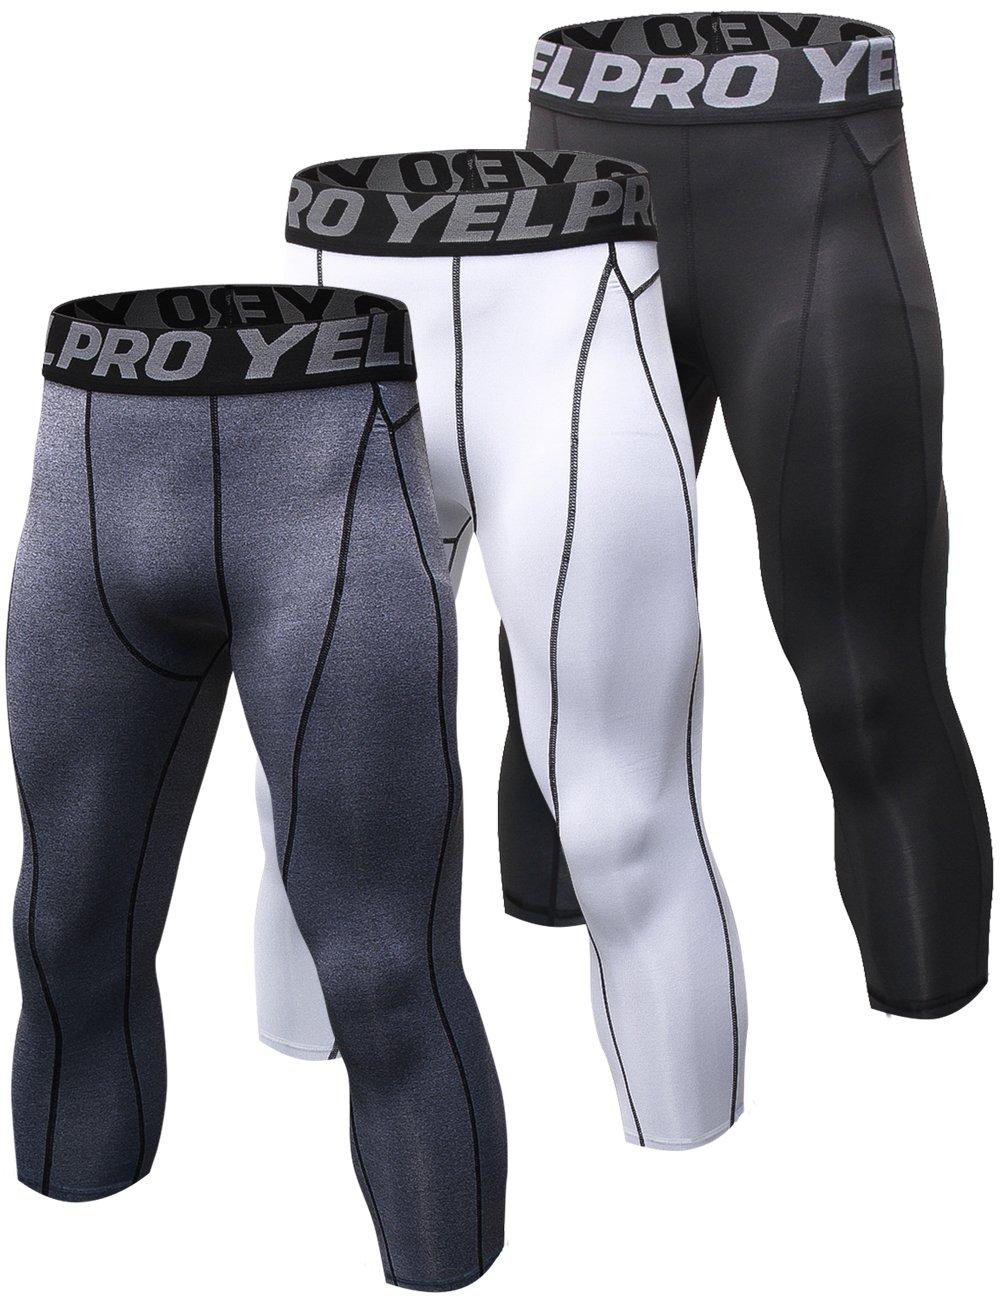 laventoメンズ圧縮ベースレイヤーカプリパンツCool Dry Runningタイツy1051 B07DJ7FPXQ 3 Pack-1051 Black/White/Gray Medium Medium|3 Pack-1051 Black/White/Gray